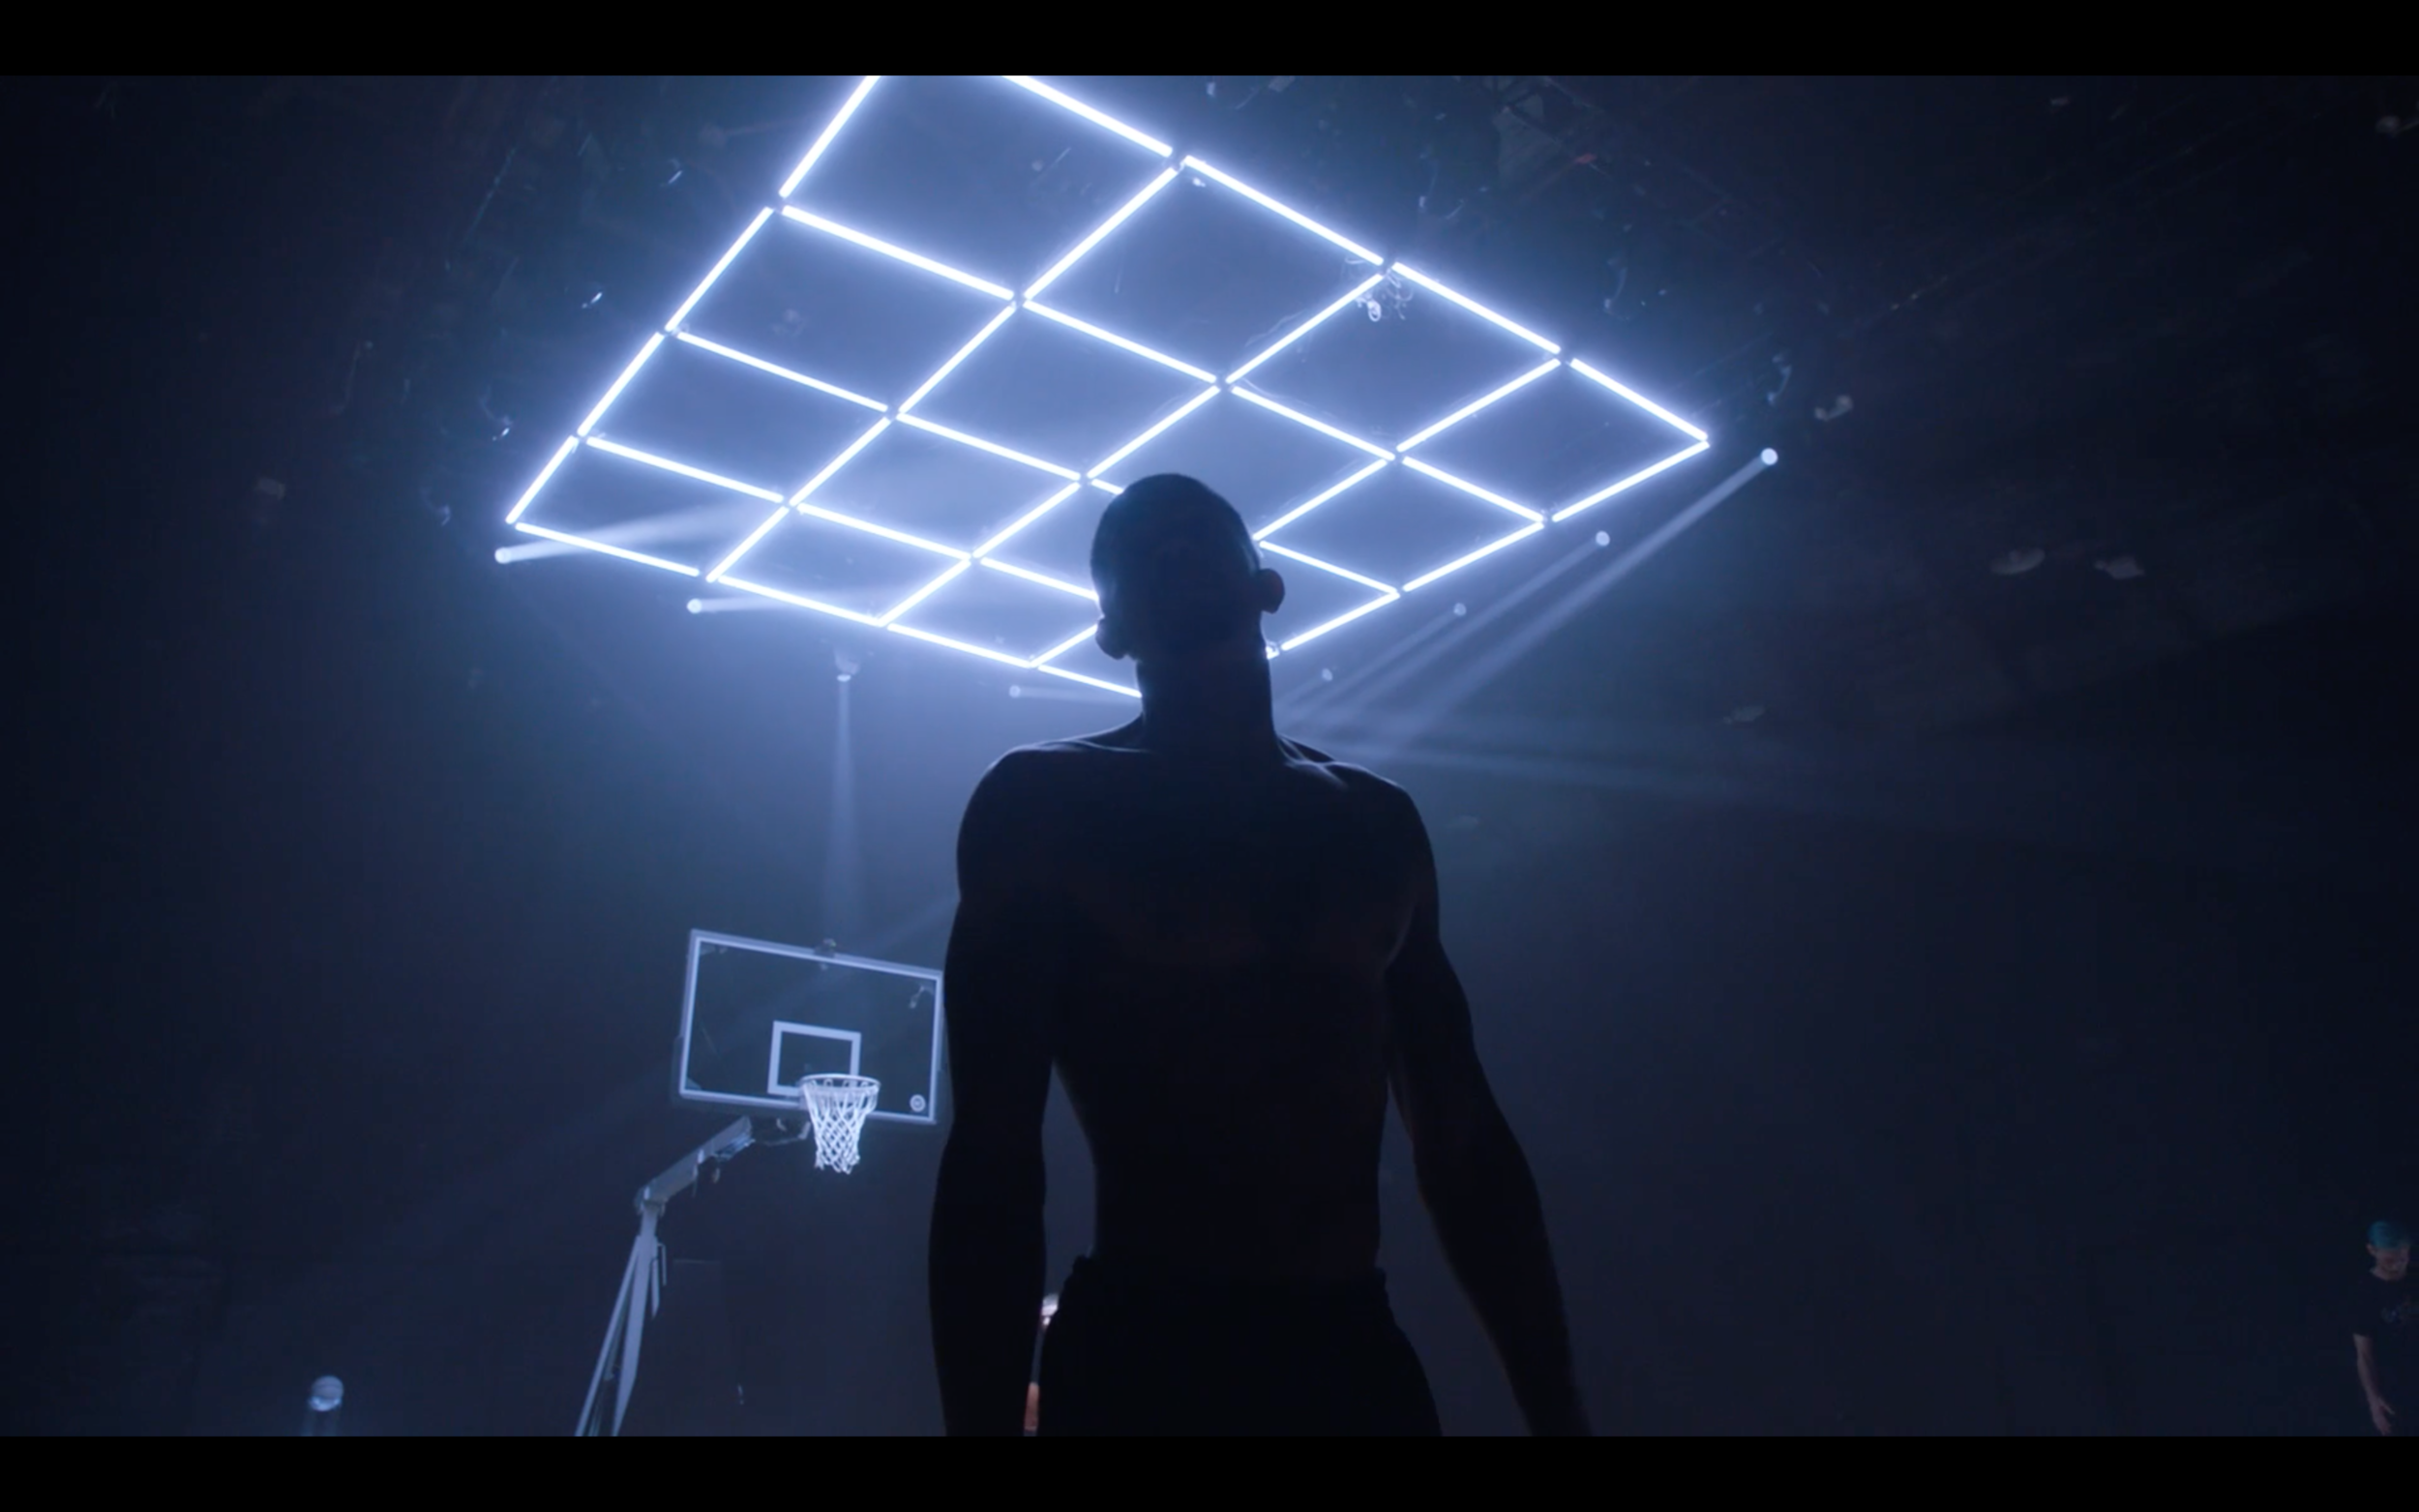 DUNK LEAGUE VOL. 2 - Teaser (Sports Entertainment Series)